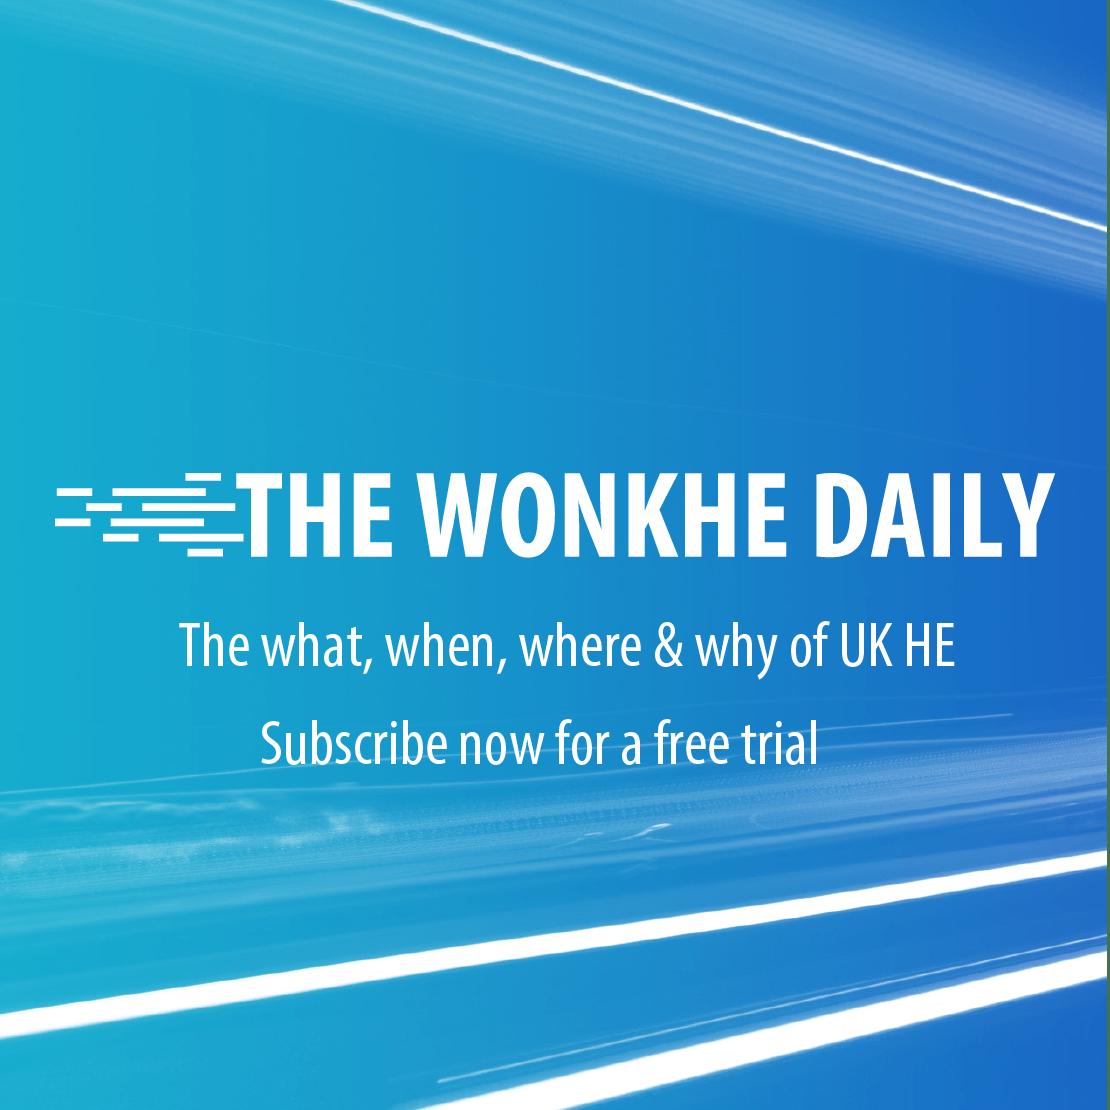 wonkhe daily